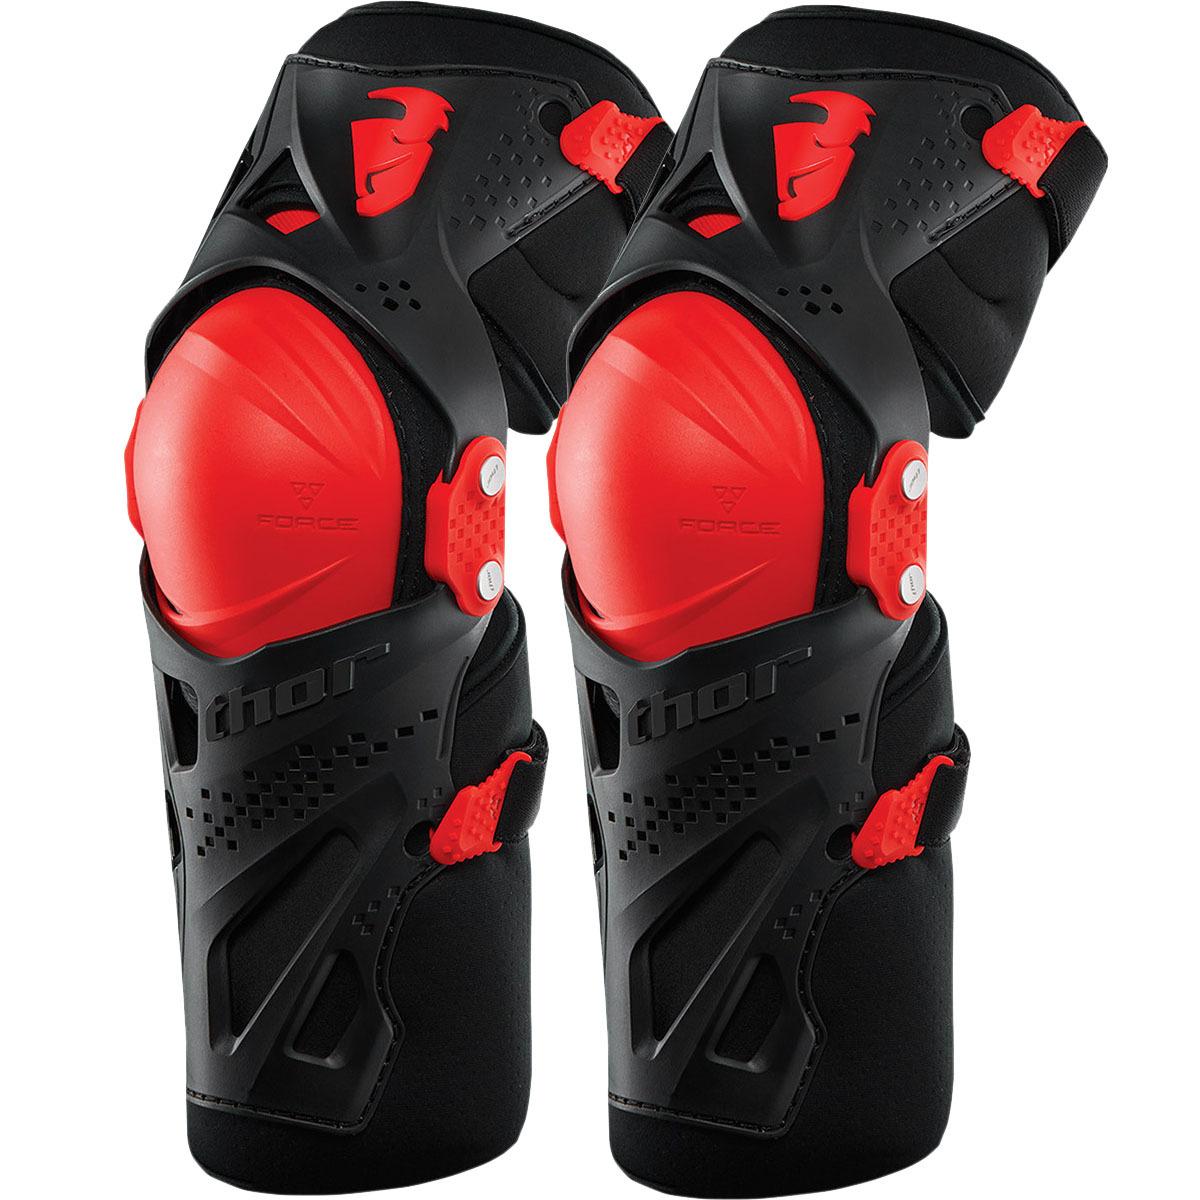 Thor - Force XP Red защита колена, красные